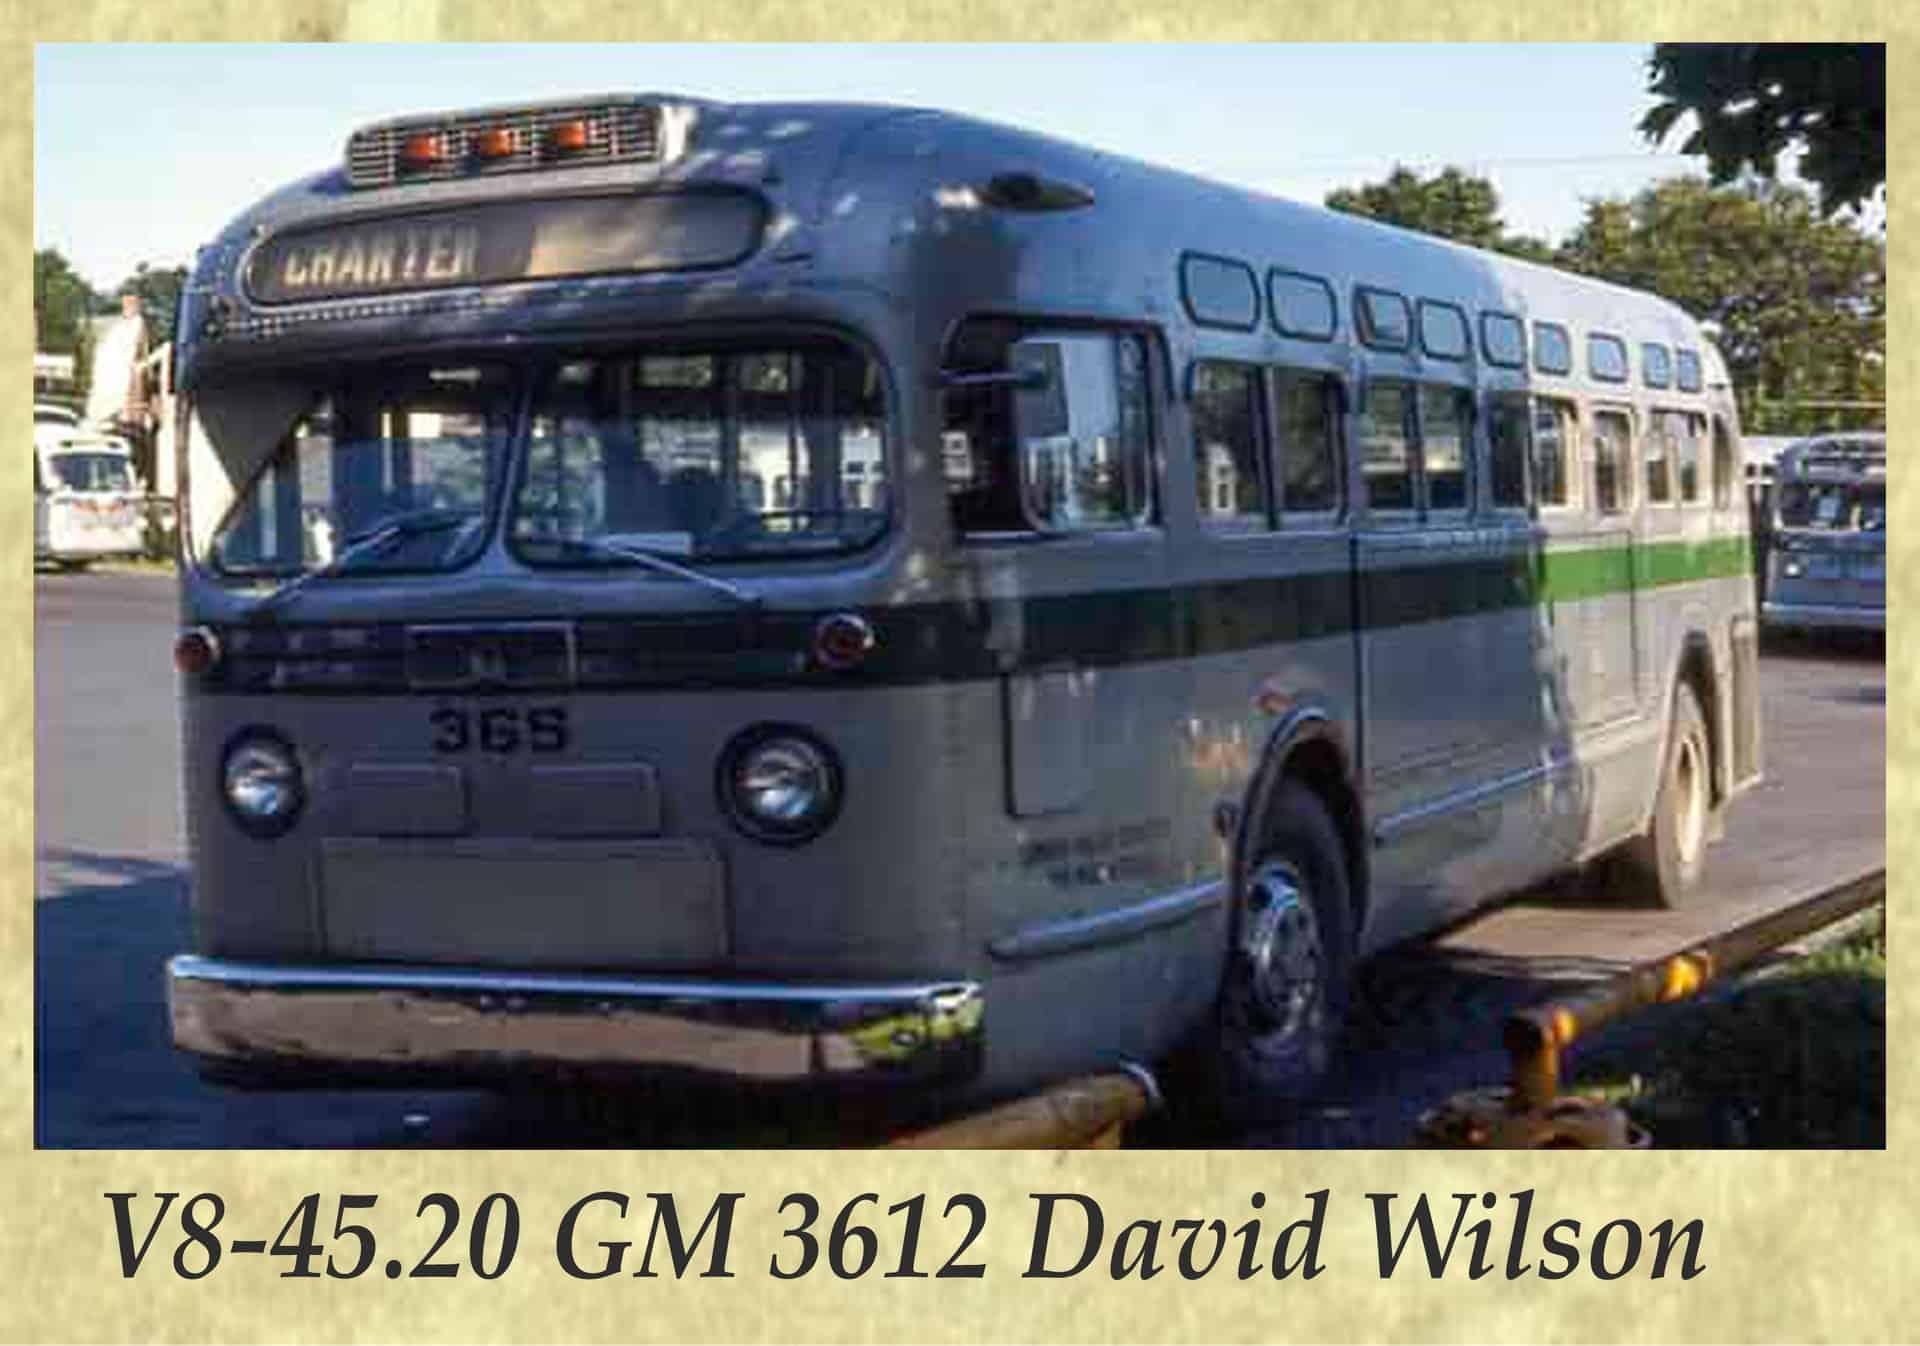 V8-45.20 GM 3612 David Wilson